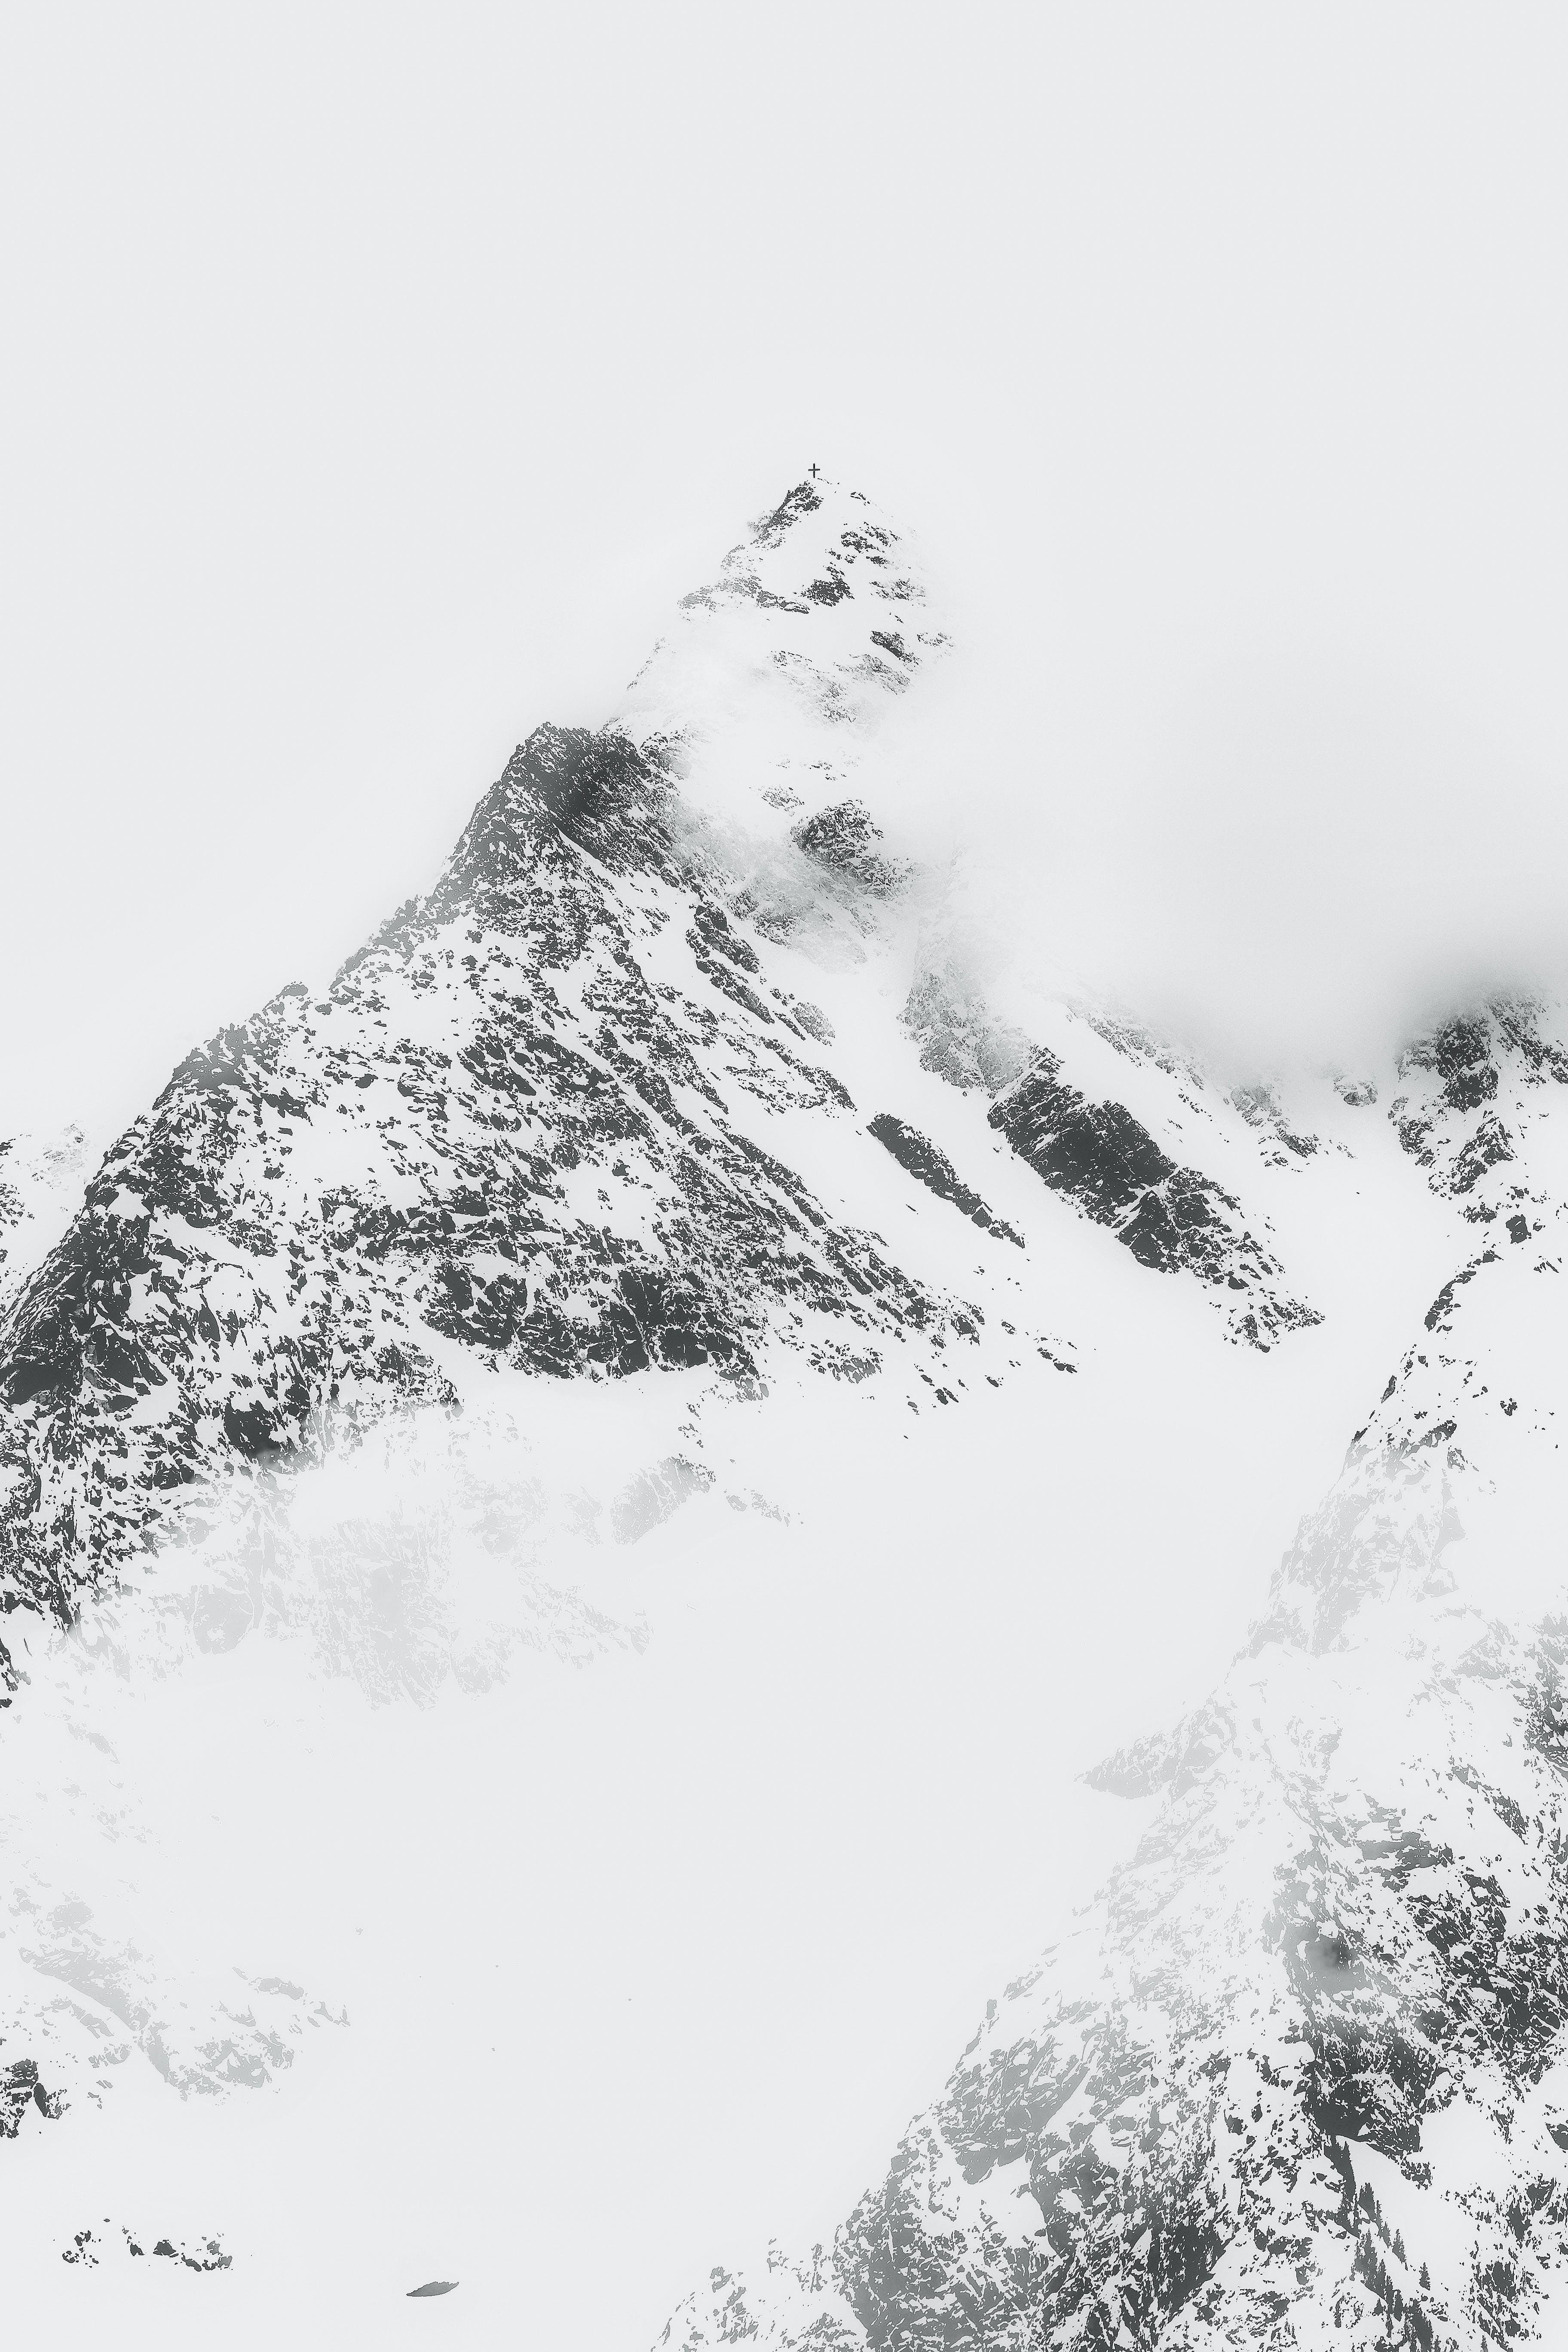 alpský, HD tapeta, hora